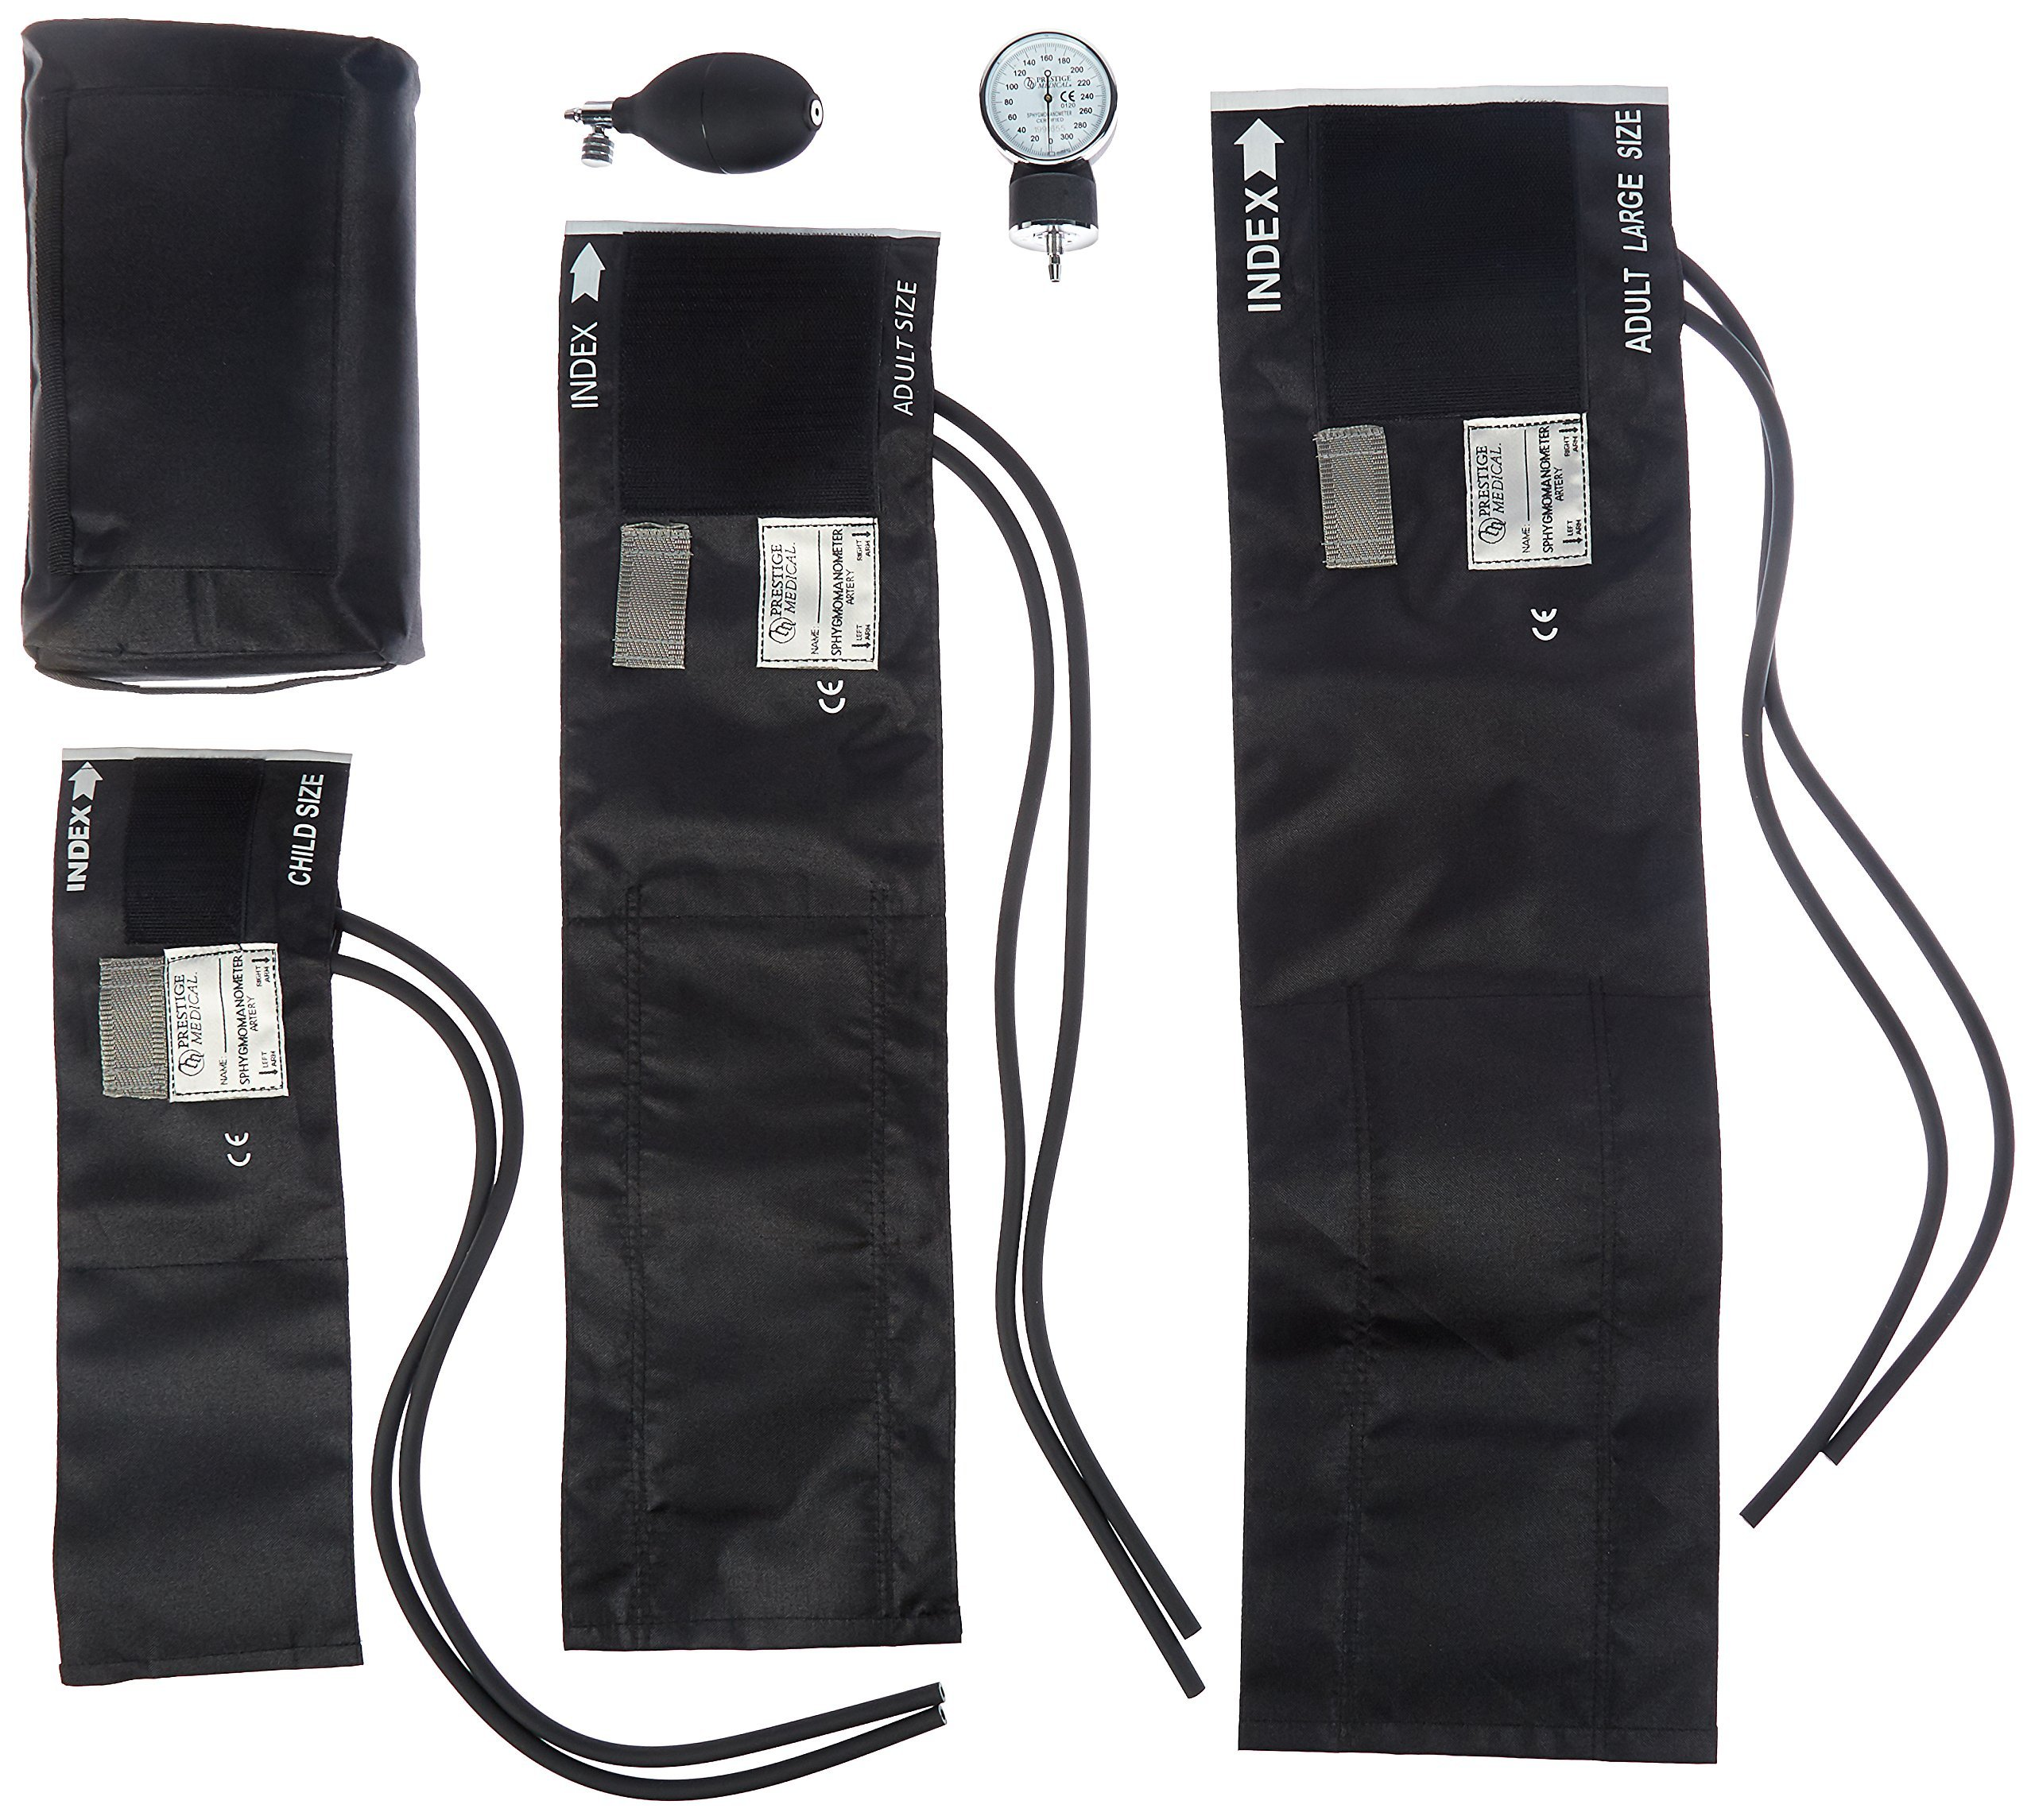 Prestige Medical 3-in-1 Aneroid Sphygmomanometer Set with Carry Case, Black by Prestige Medical